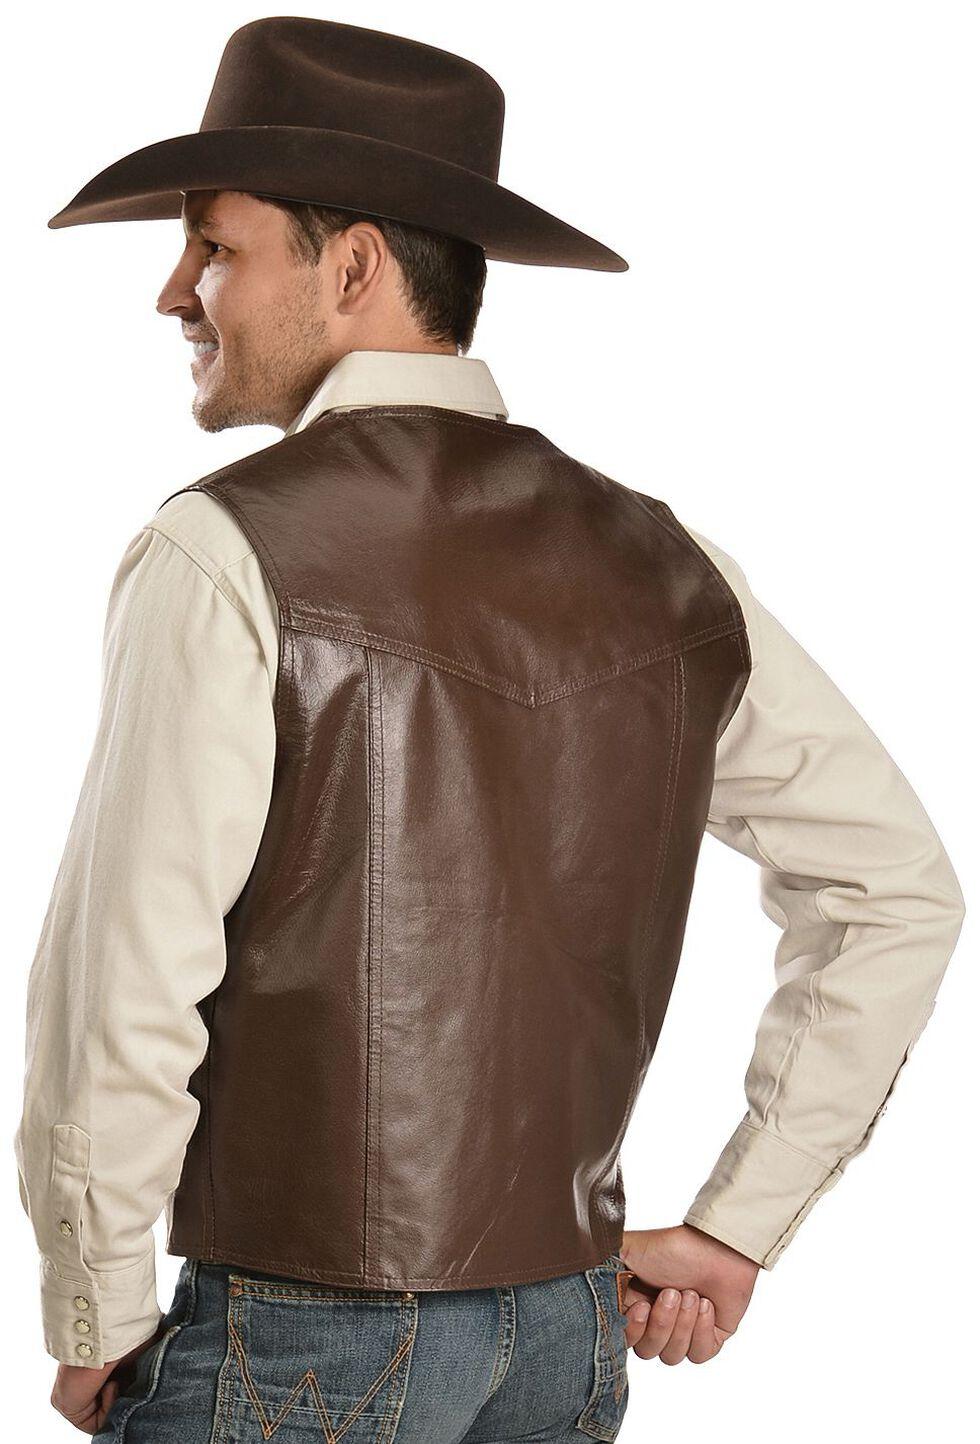 Vintage Leather Western Yoke Genuine Leather Vest, Brown, hi-res